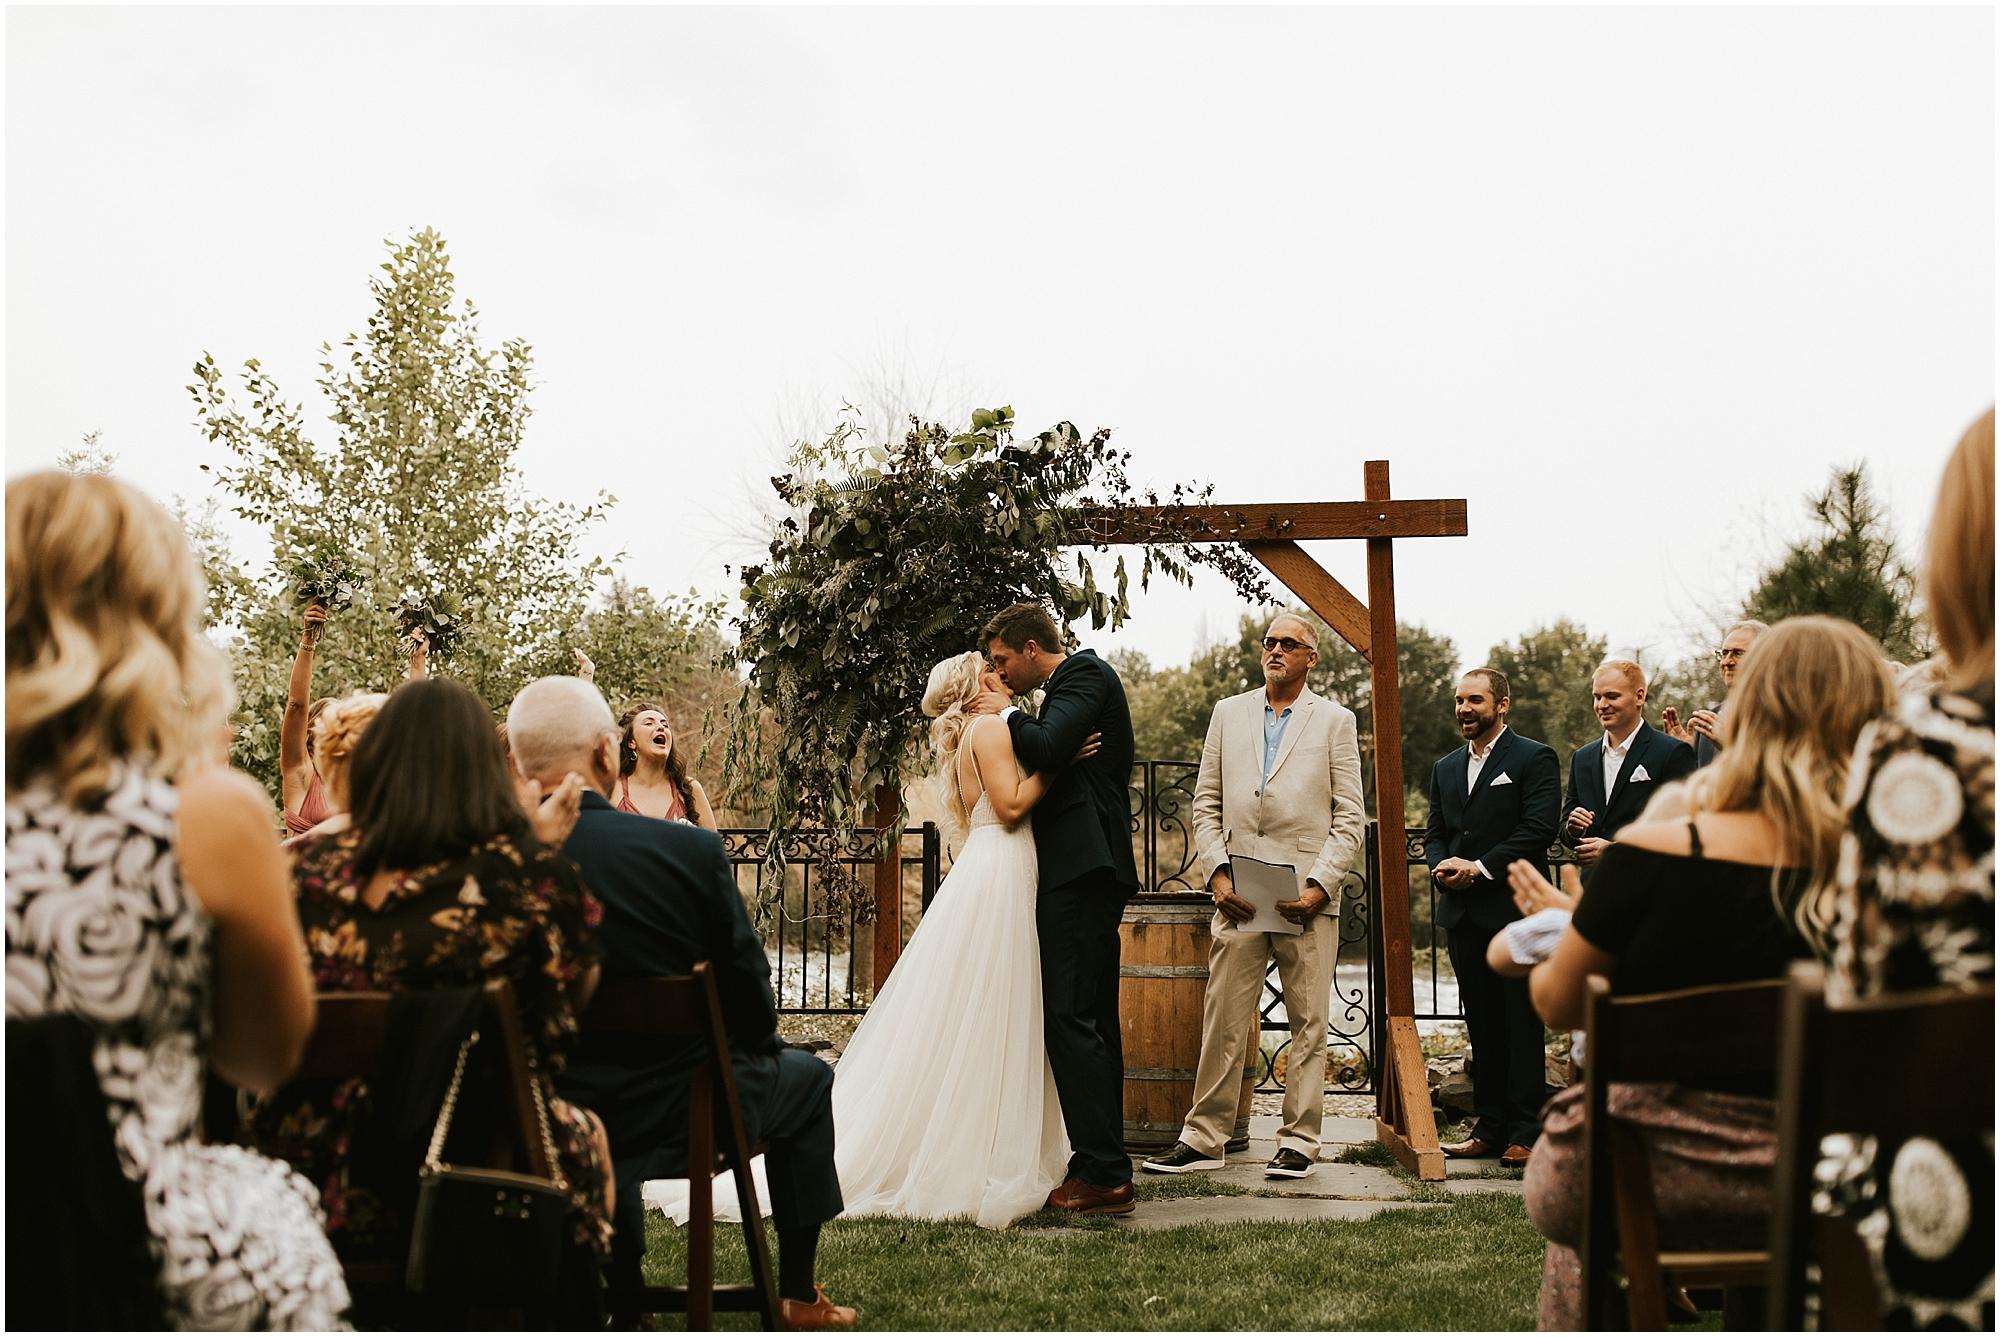 Chateau Rive Spokane Wedding Cassie Trottier Photography1087.jpg